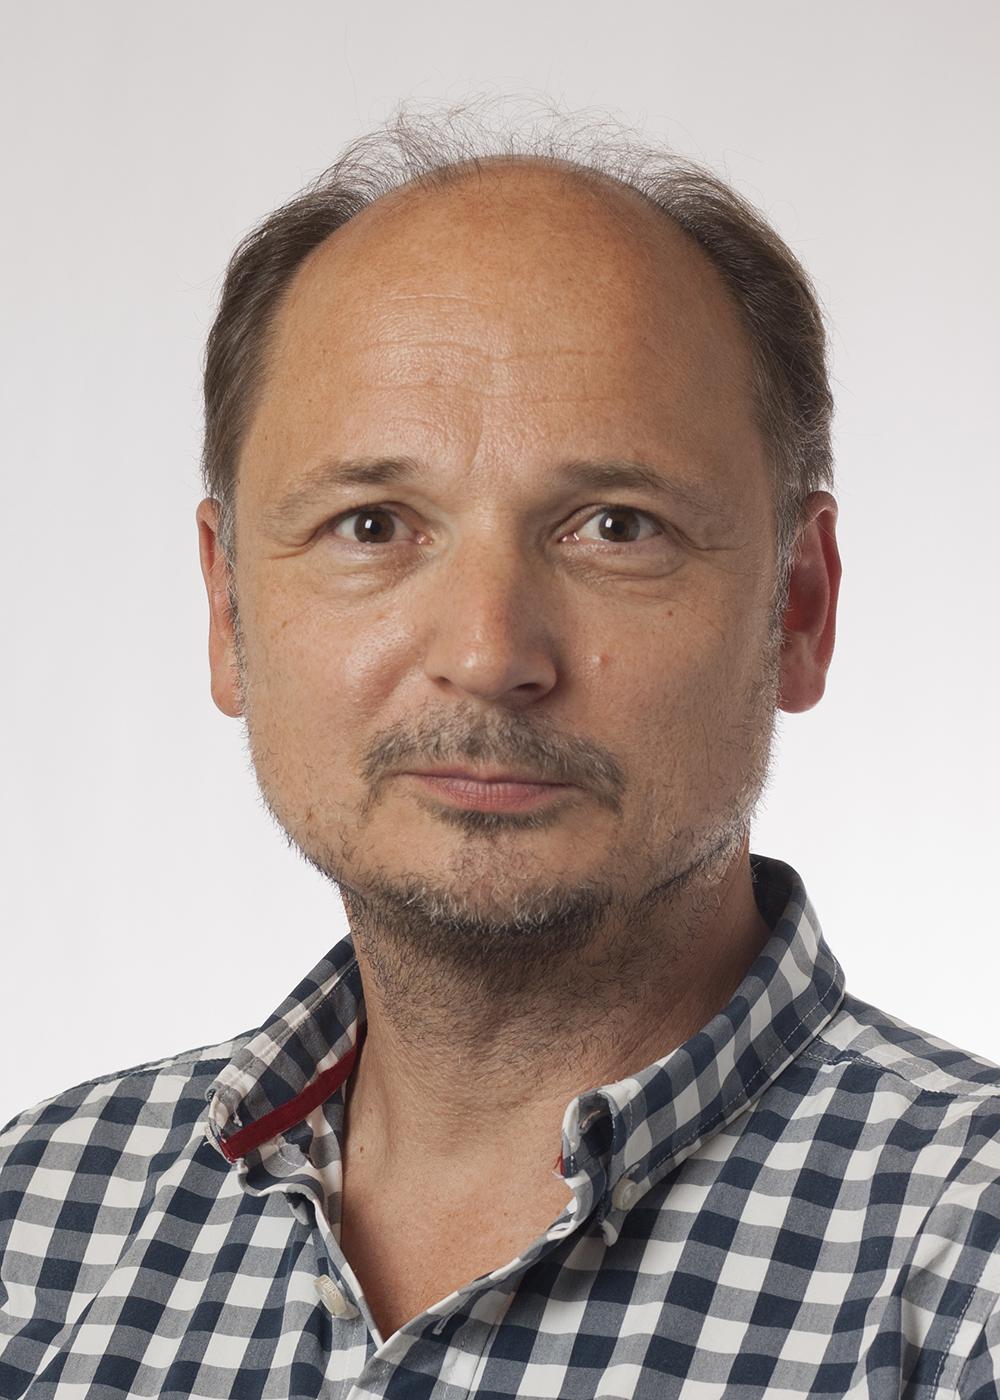 Frank Panitz